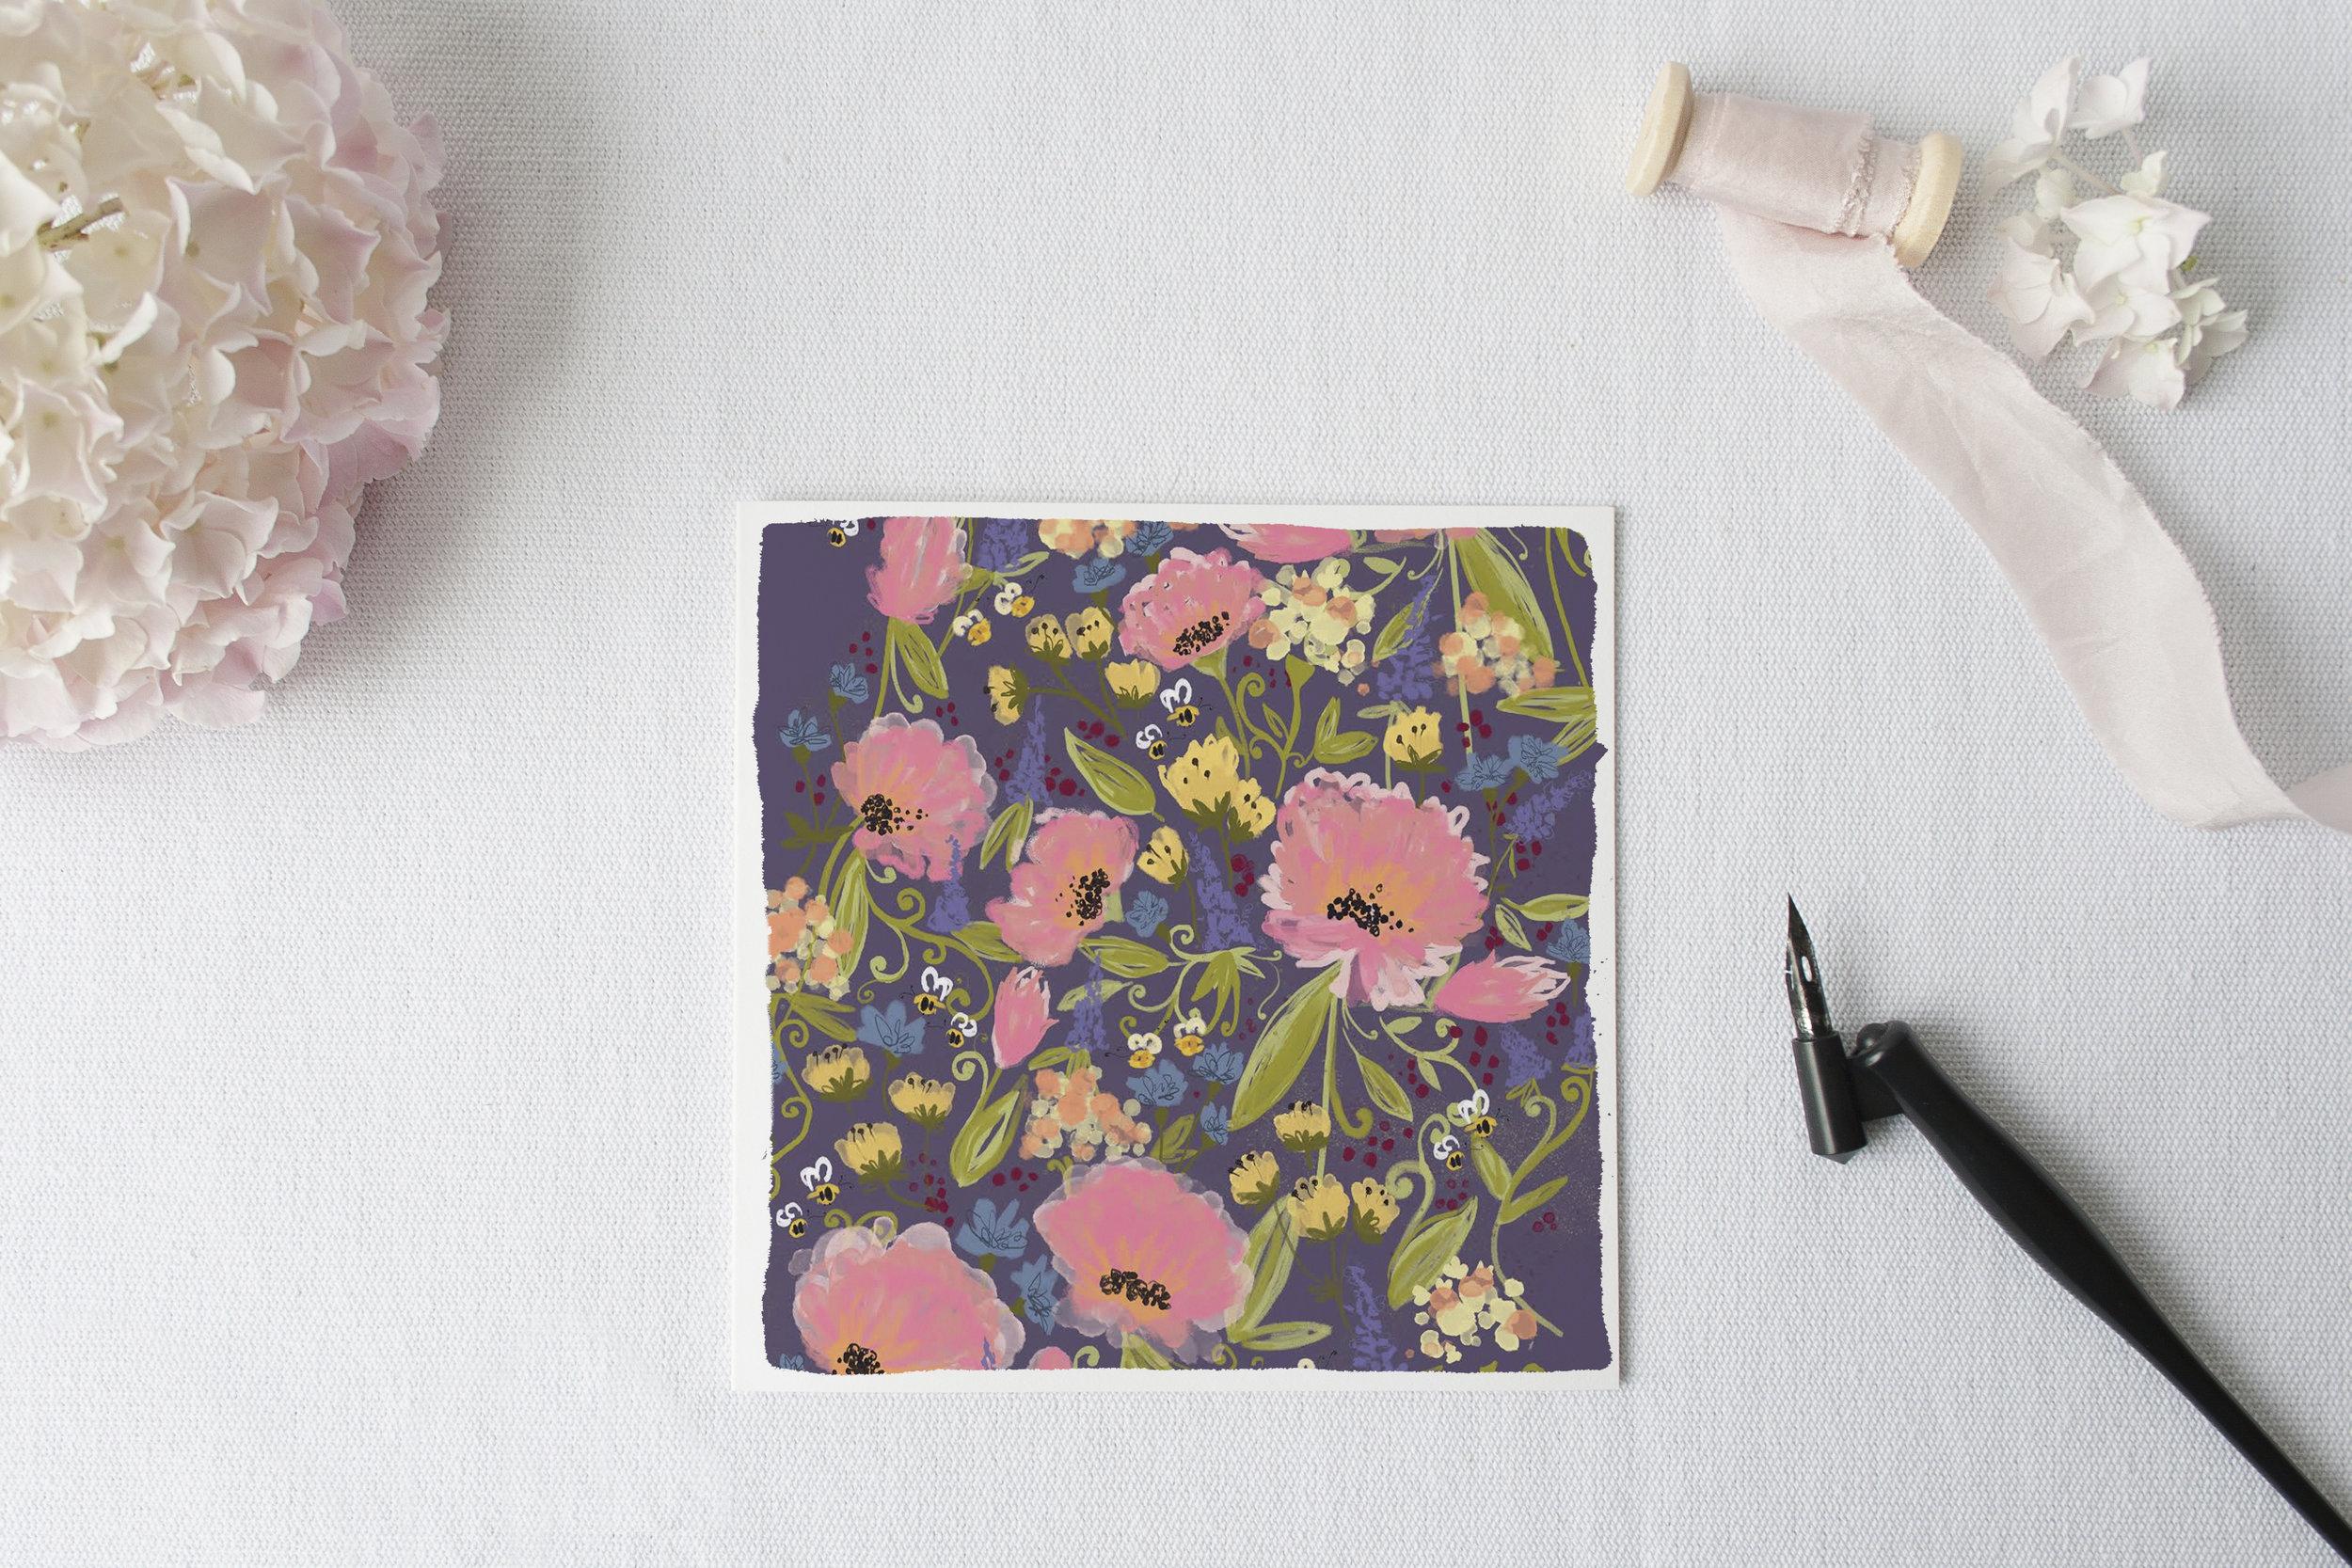 Honeybee Garden on Lavender by Joy Laforme for Woodmansterne